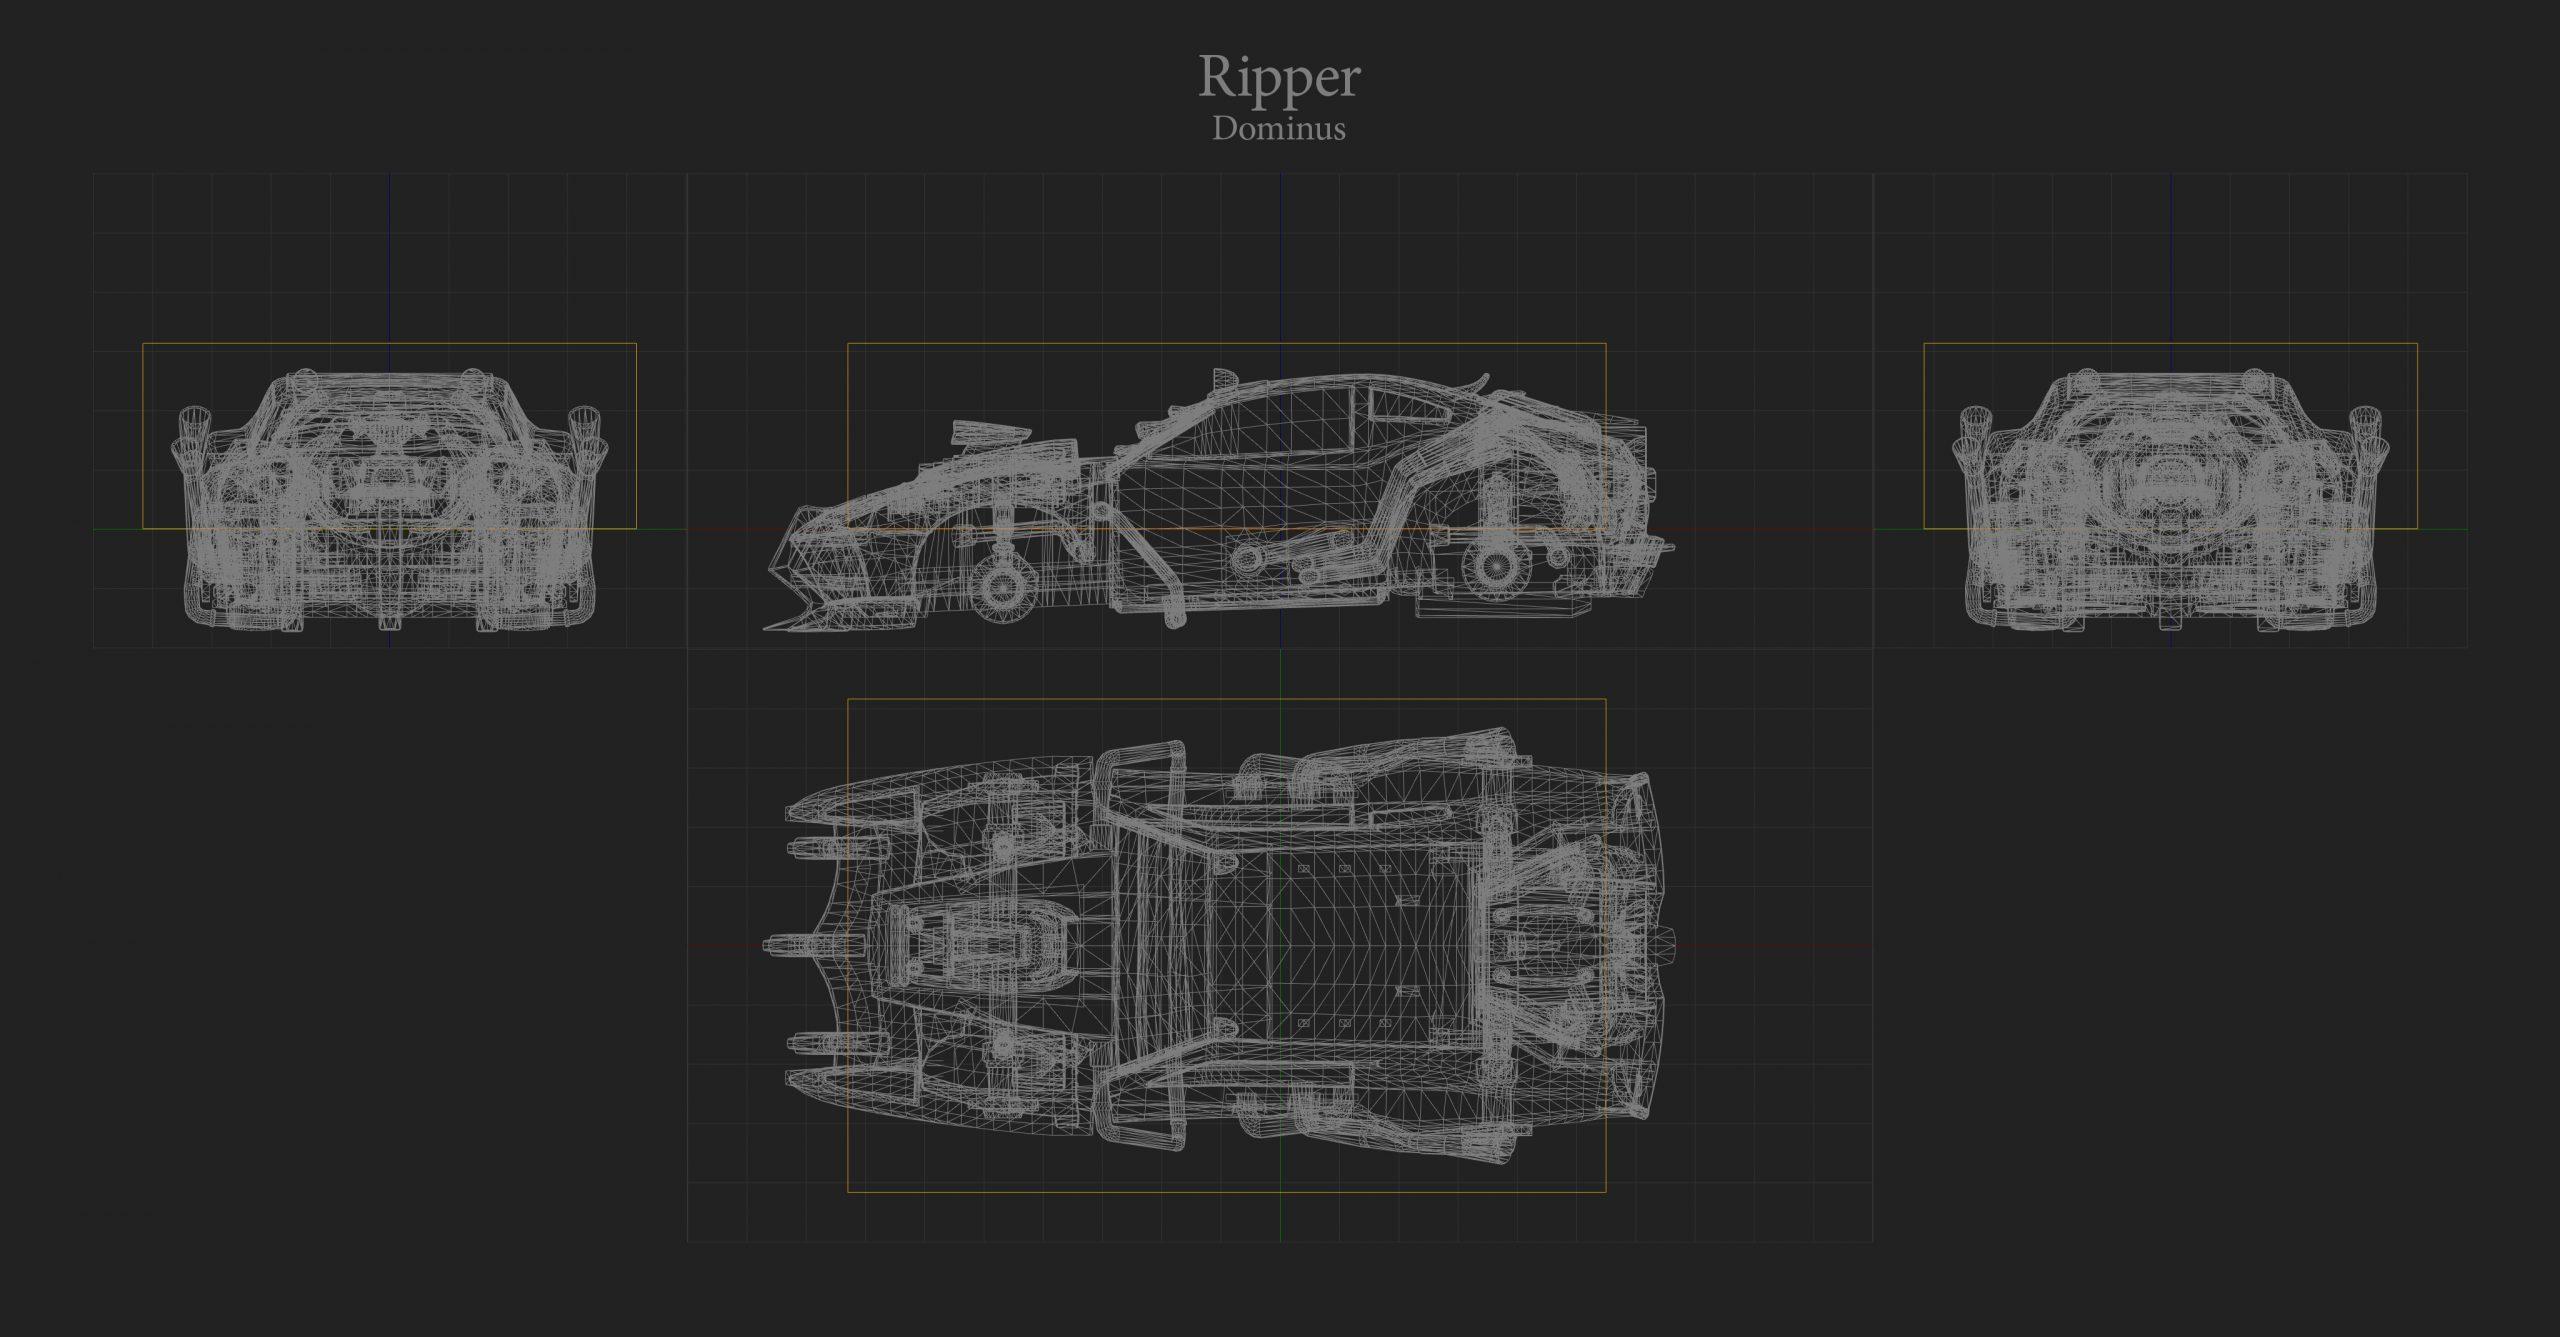 Ripper Hitbox Rocket League